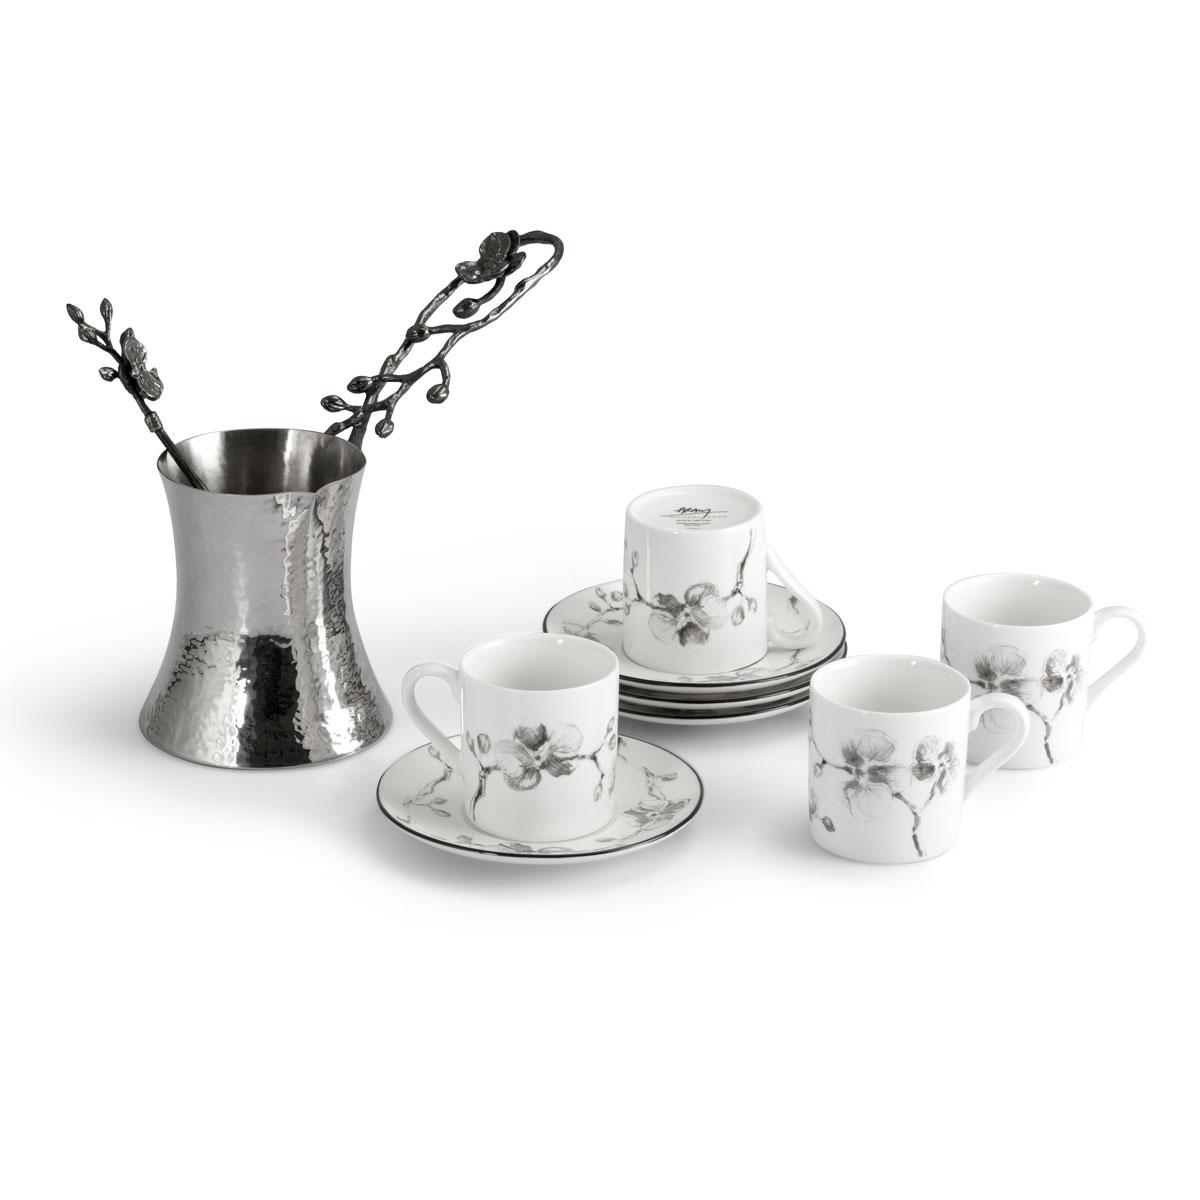 Michael Aram Black Orchid Coffee Pot and Demitasse Set